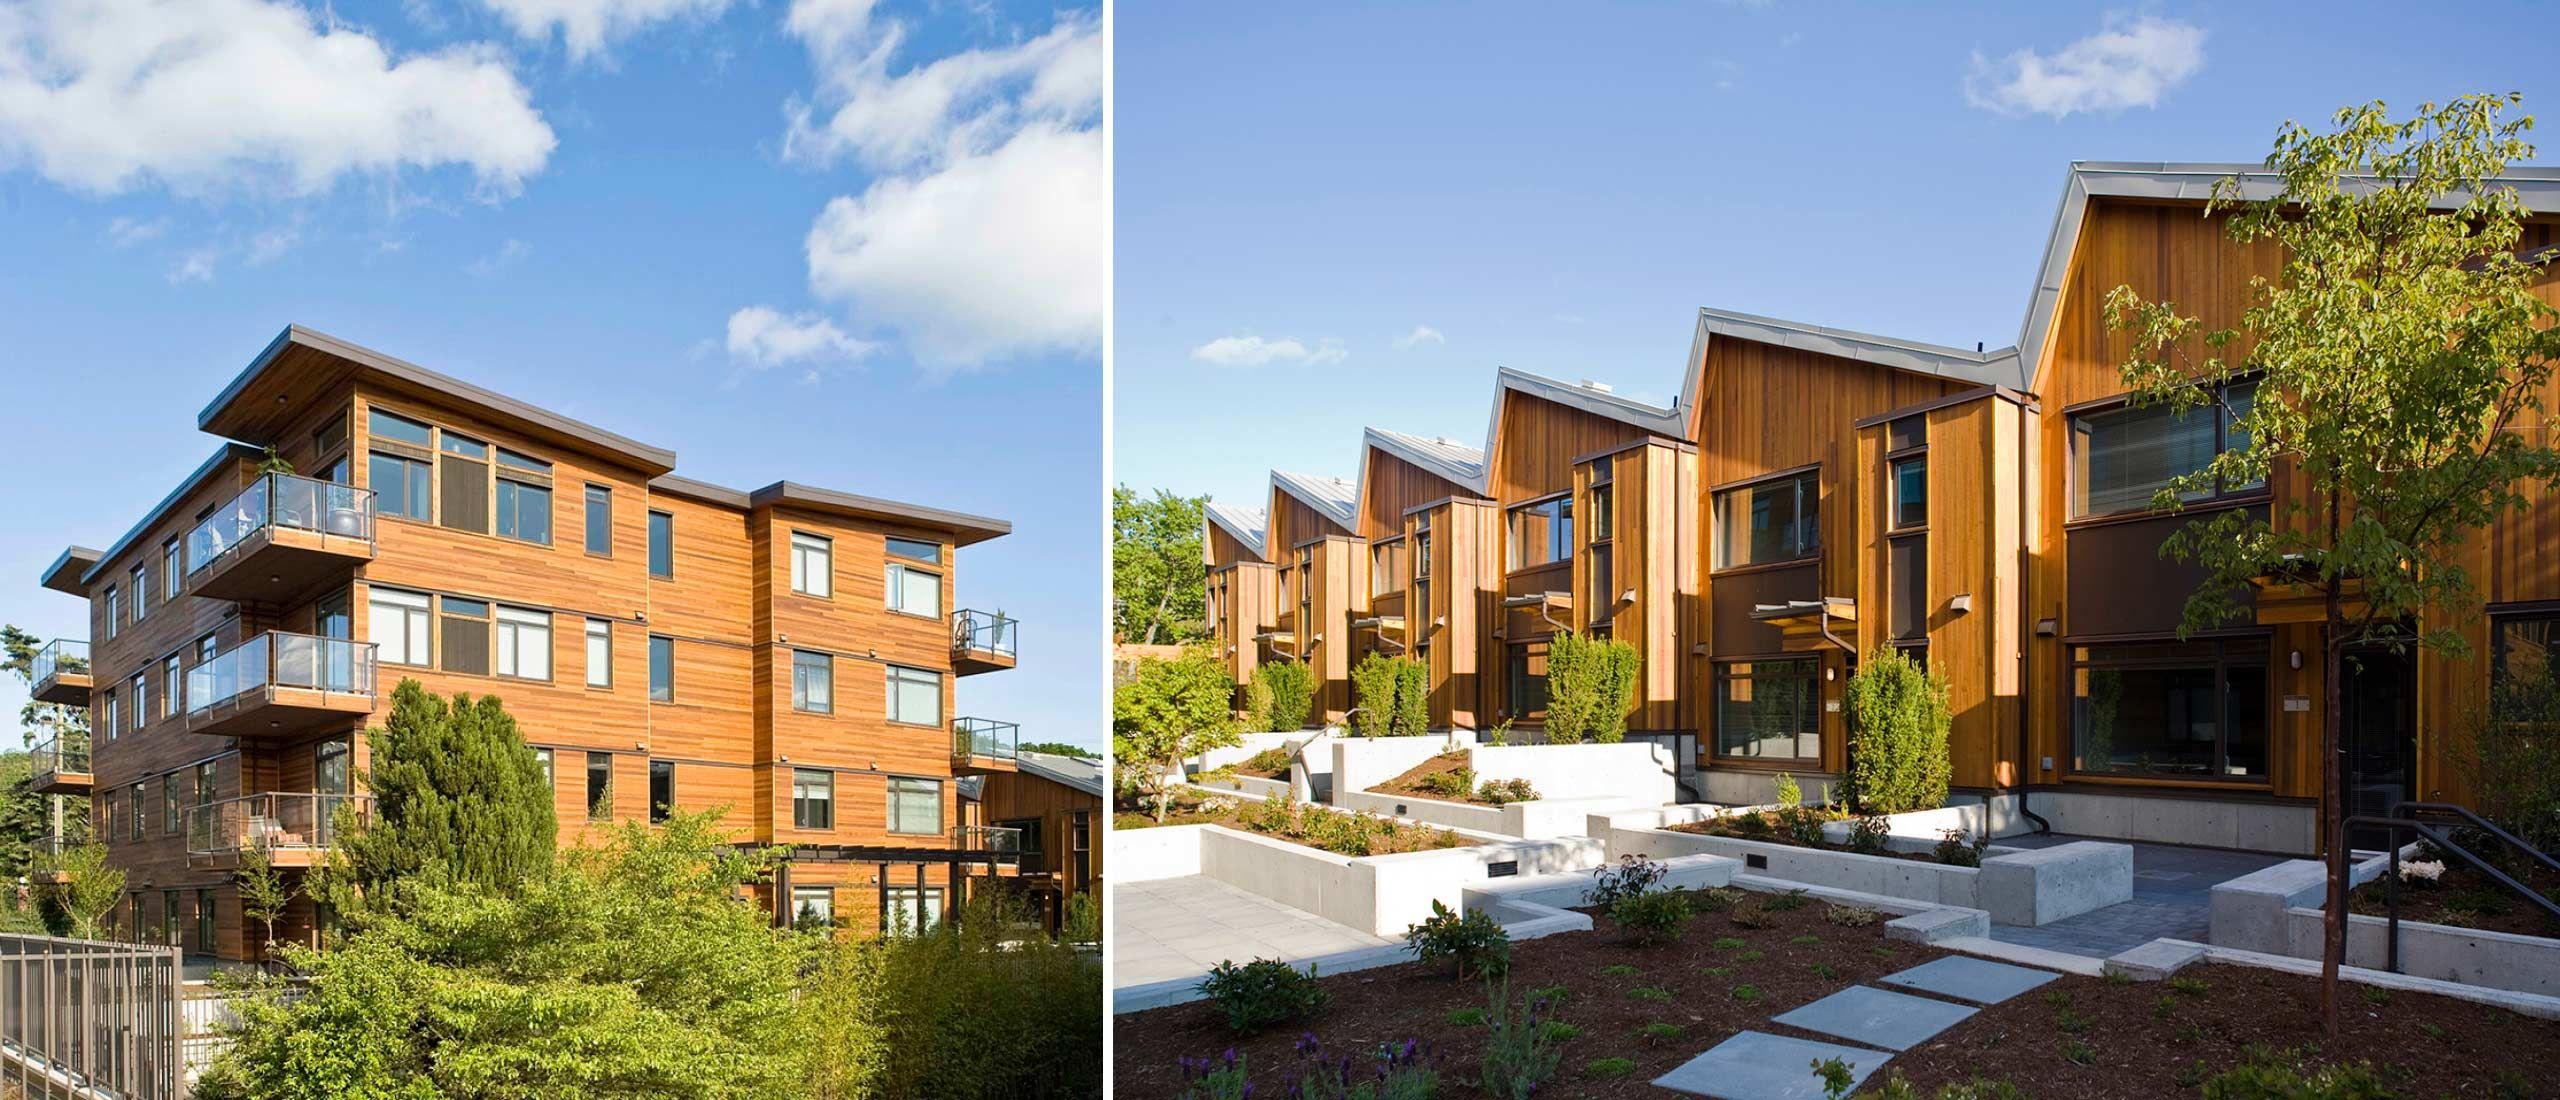 Richmond Gate Apartments D Ambrosio Architecture Urbanism Architectural Practice Architecture House Styles